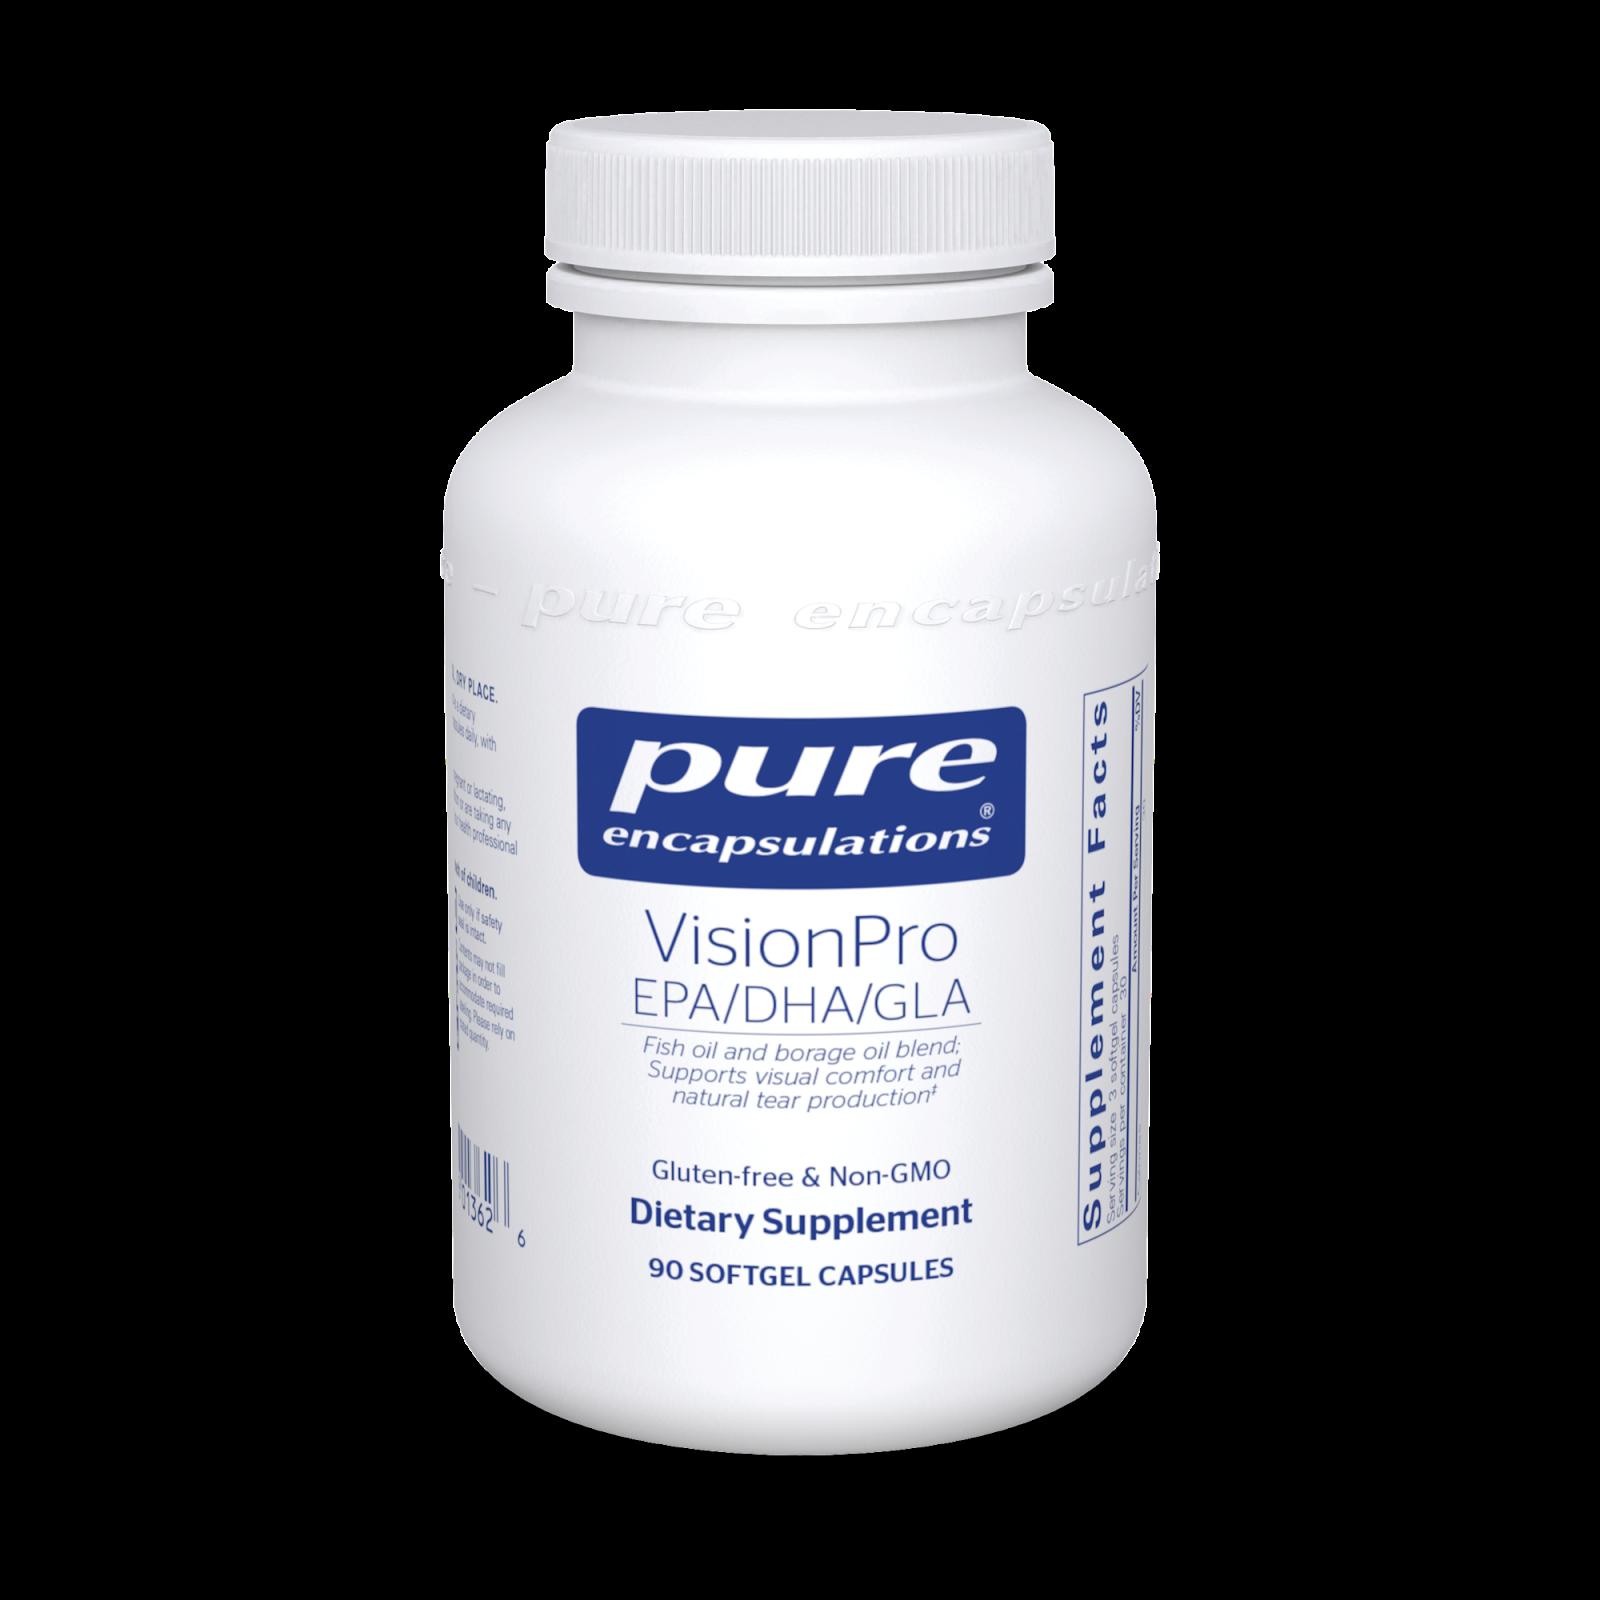 VisionPro EPA/DHA/GLA